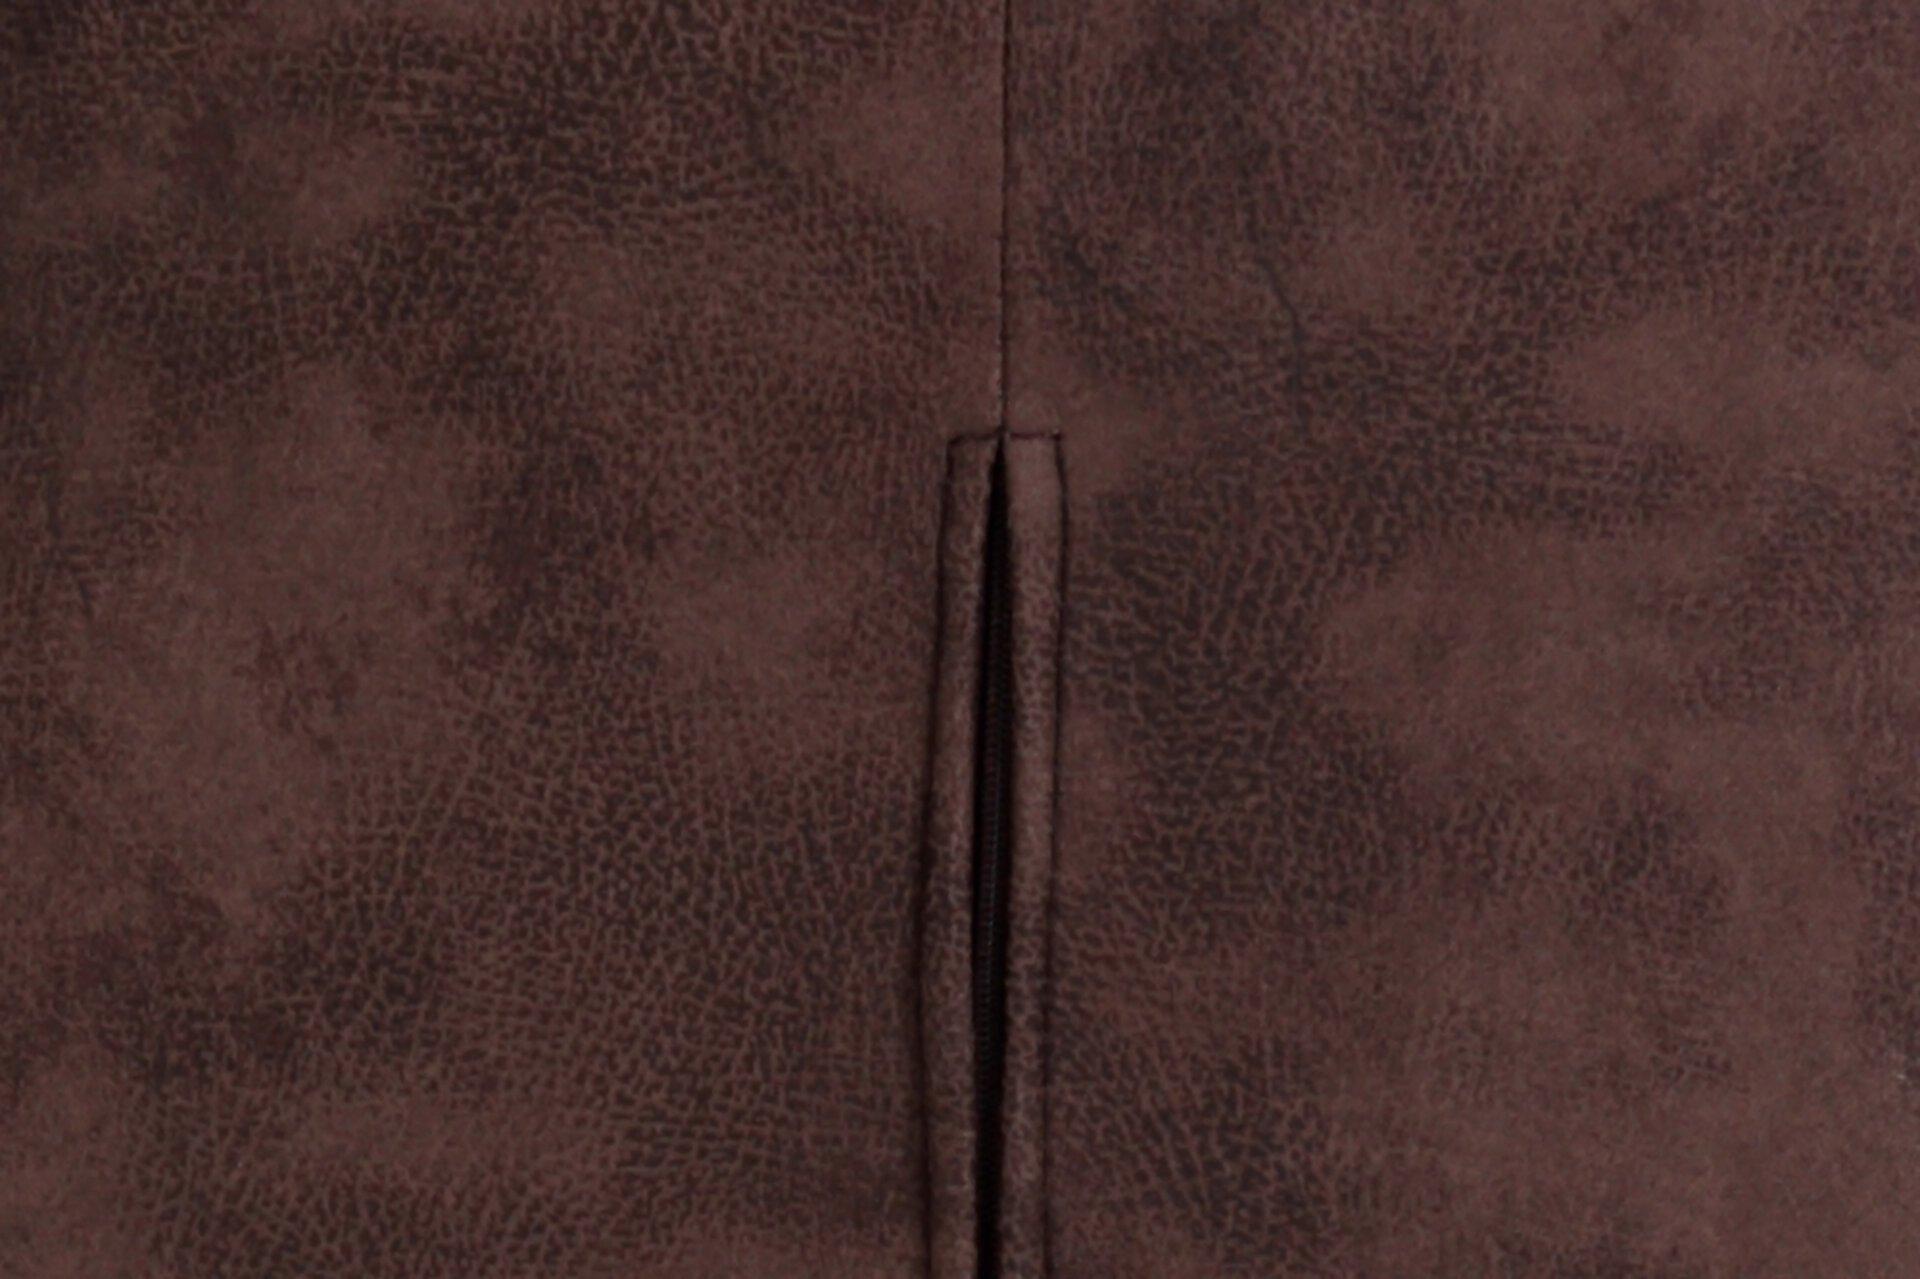 Barhocker Sonja H Dinett Textil 61 x 96 x 42 cm